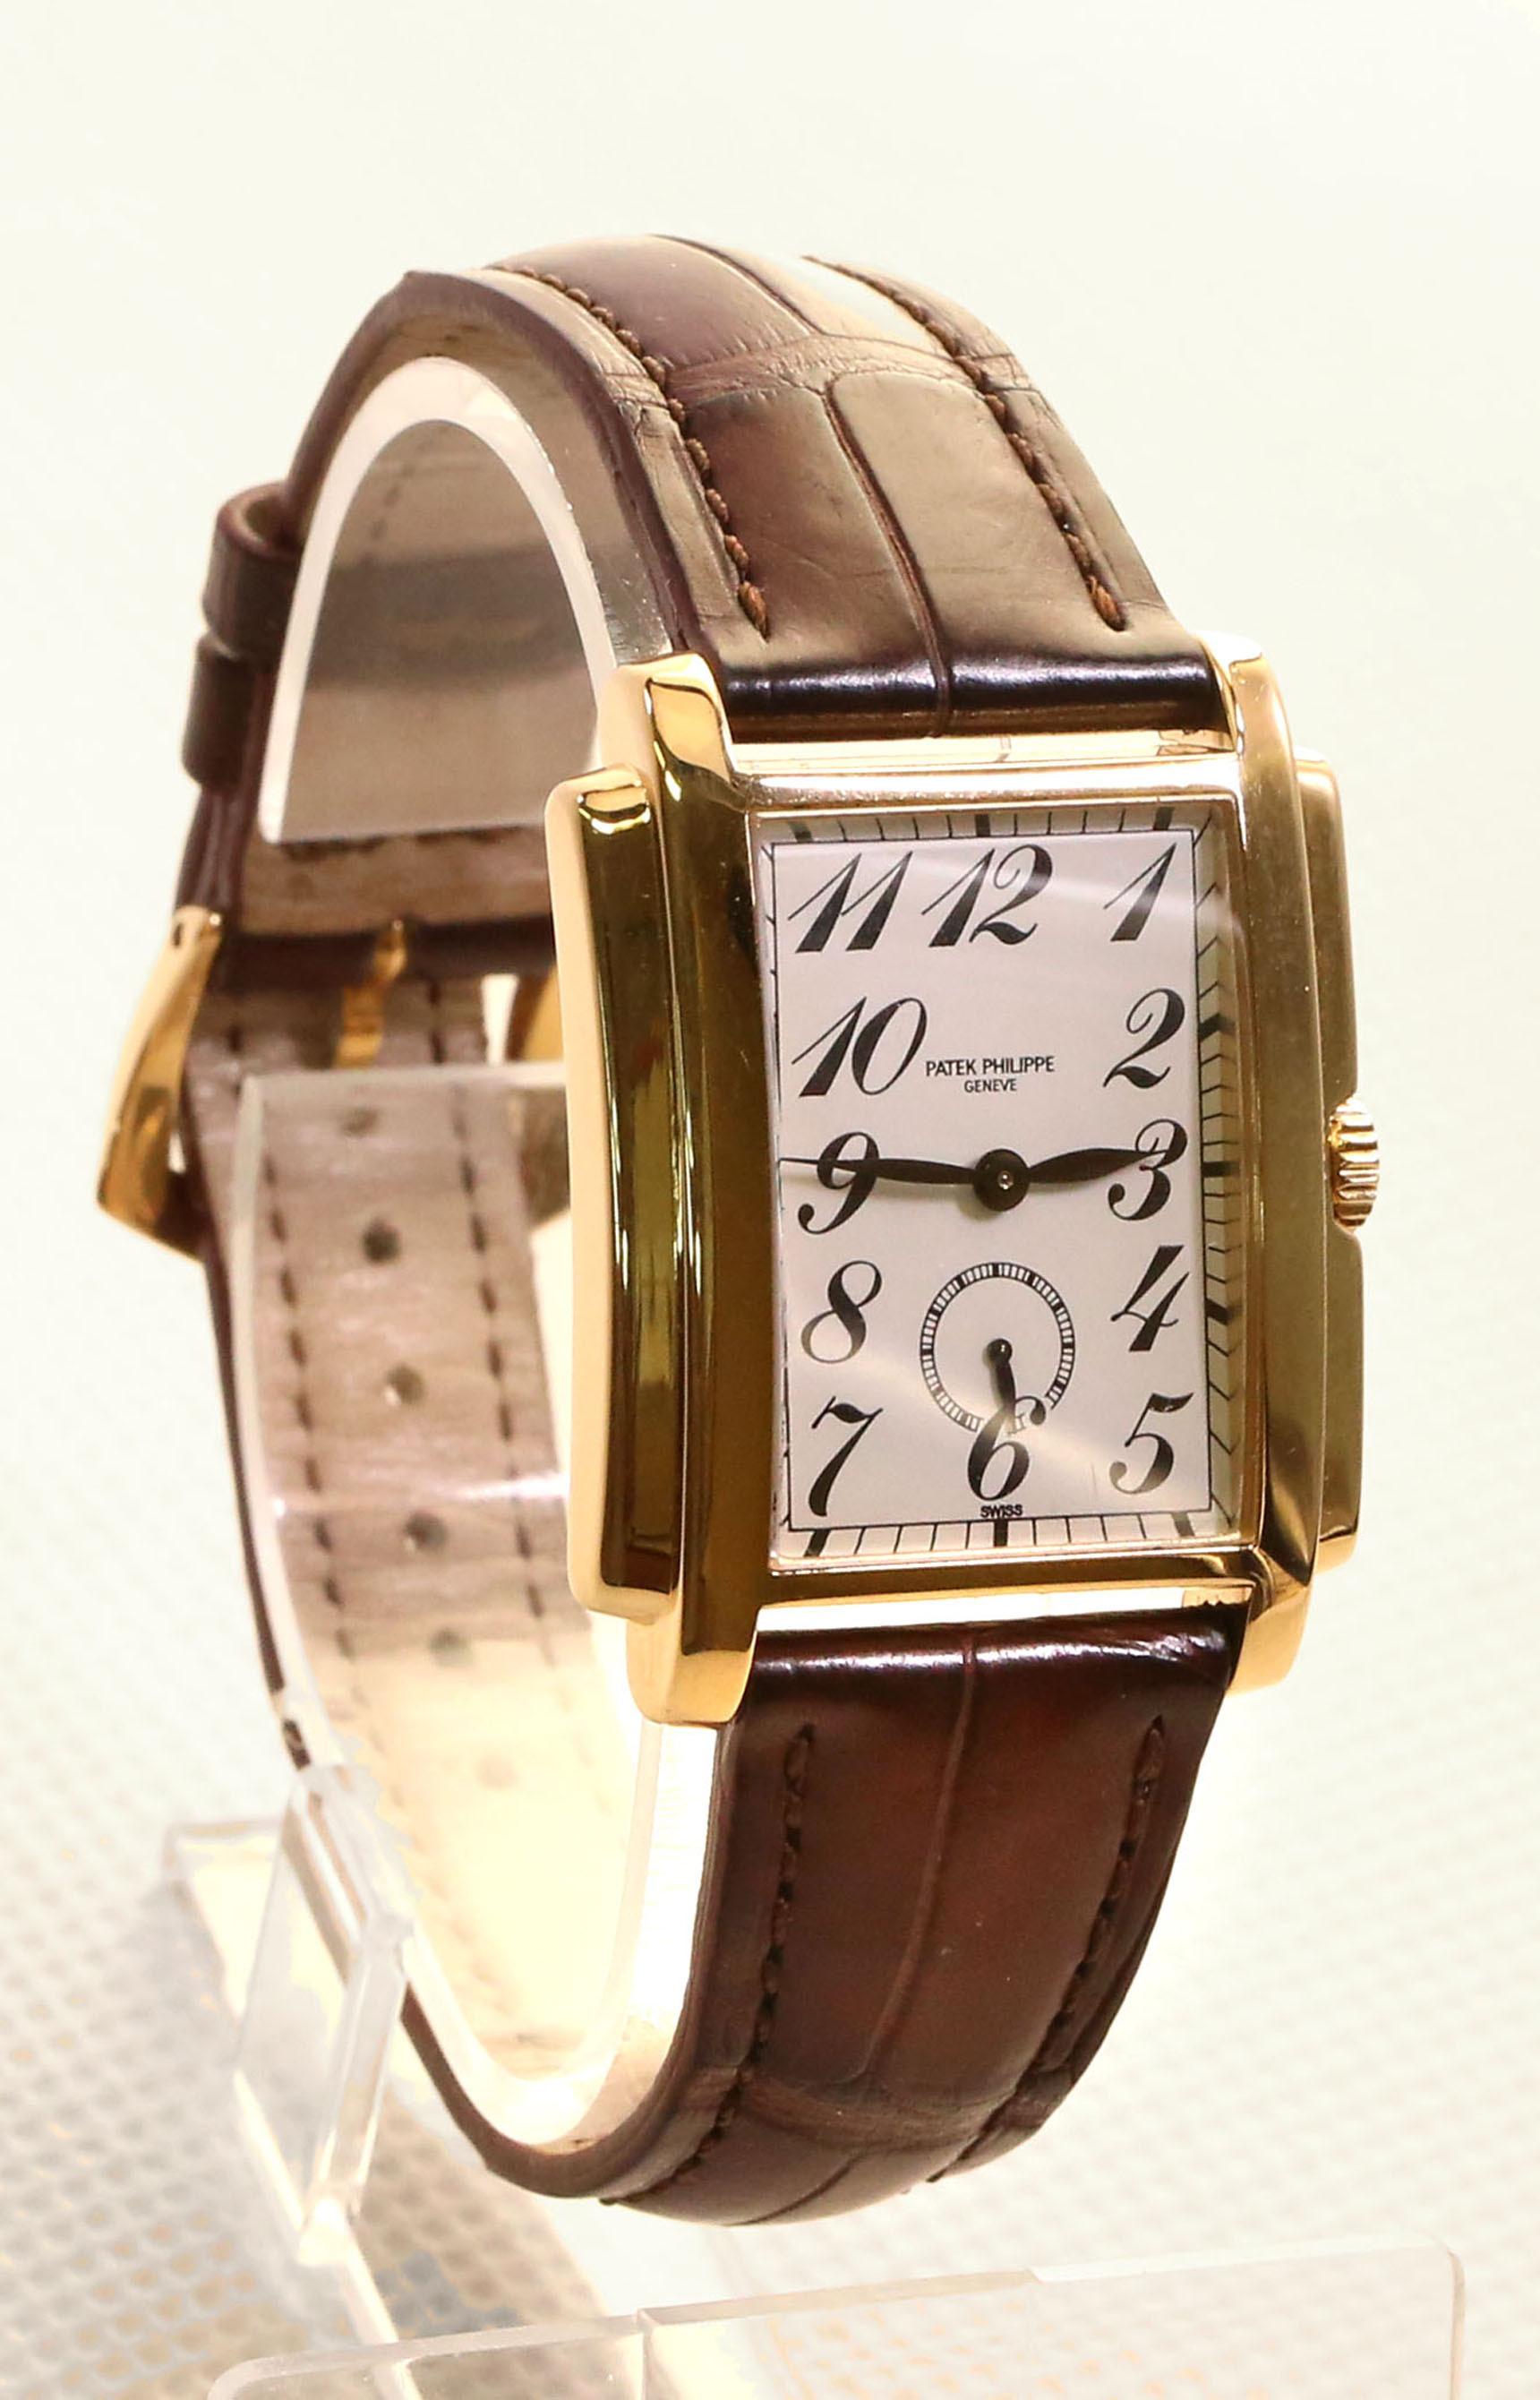 Zegarek Patek Philippe Gondolo Złoty - Ref. 5024